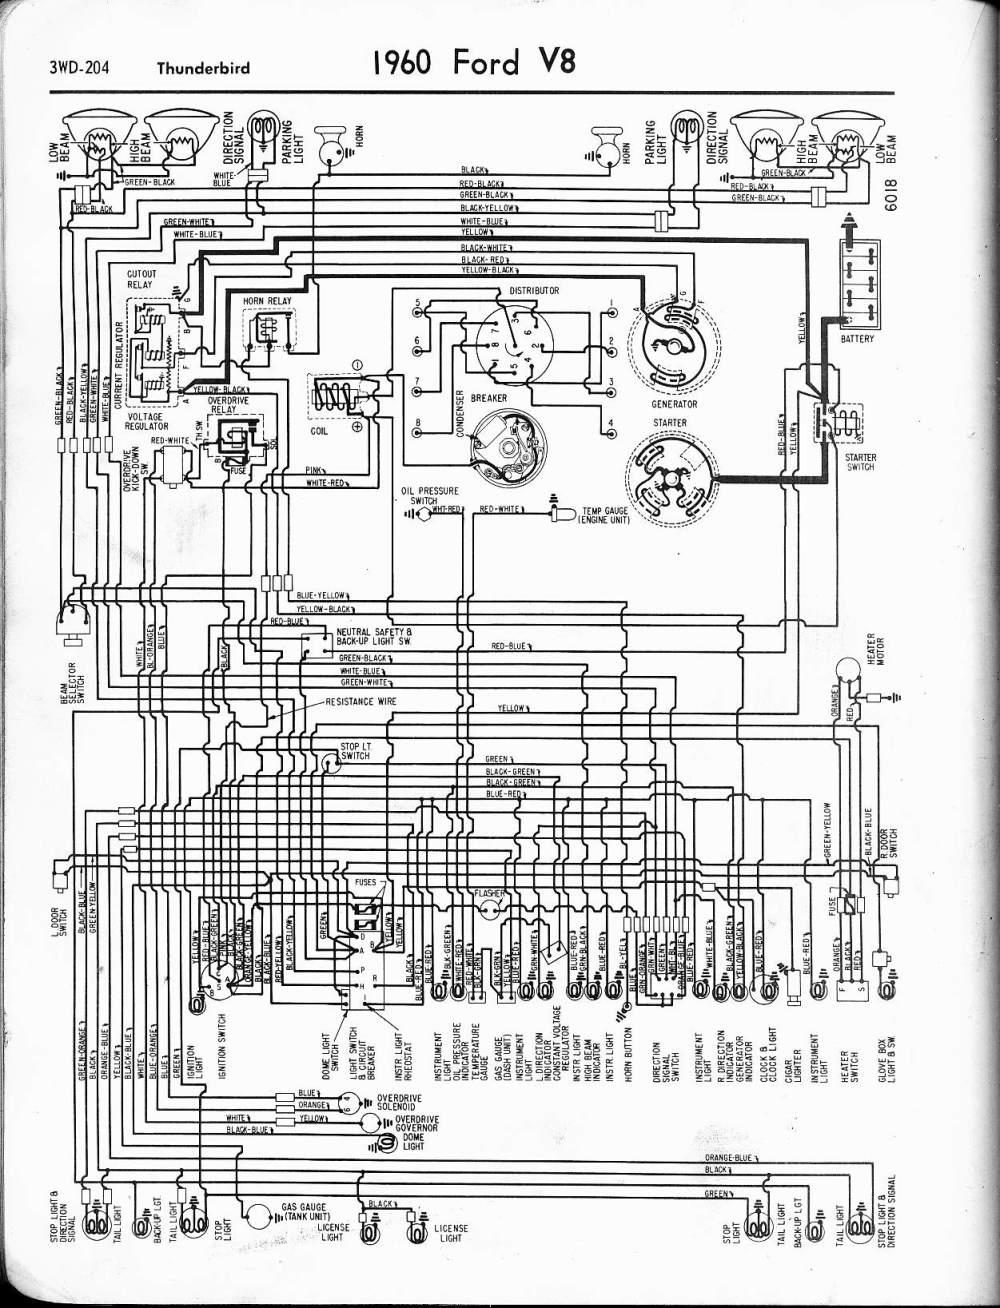 medium resolution of 1956 mga wiring diagram wiring diagram third level1960 mga wiring diagram wiring library 1999 ford f